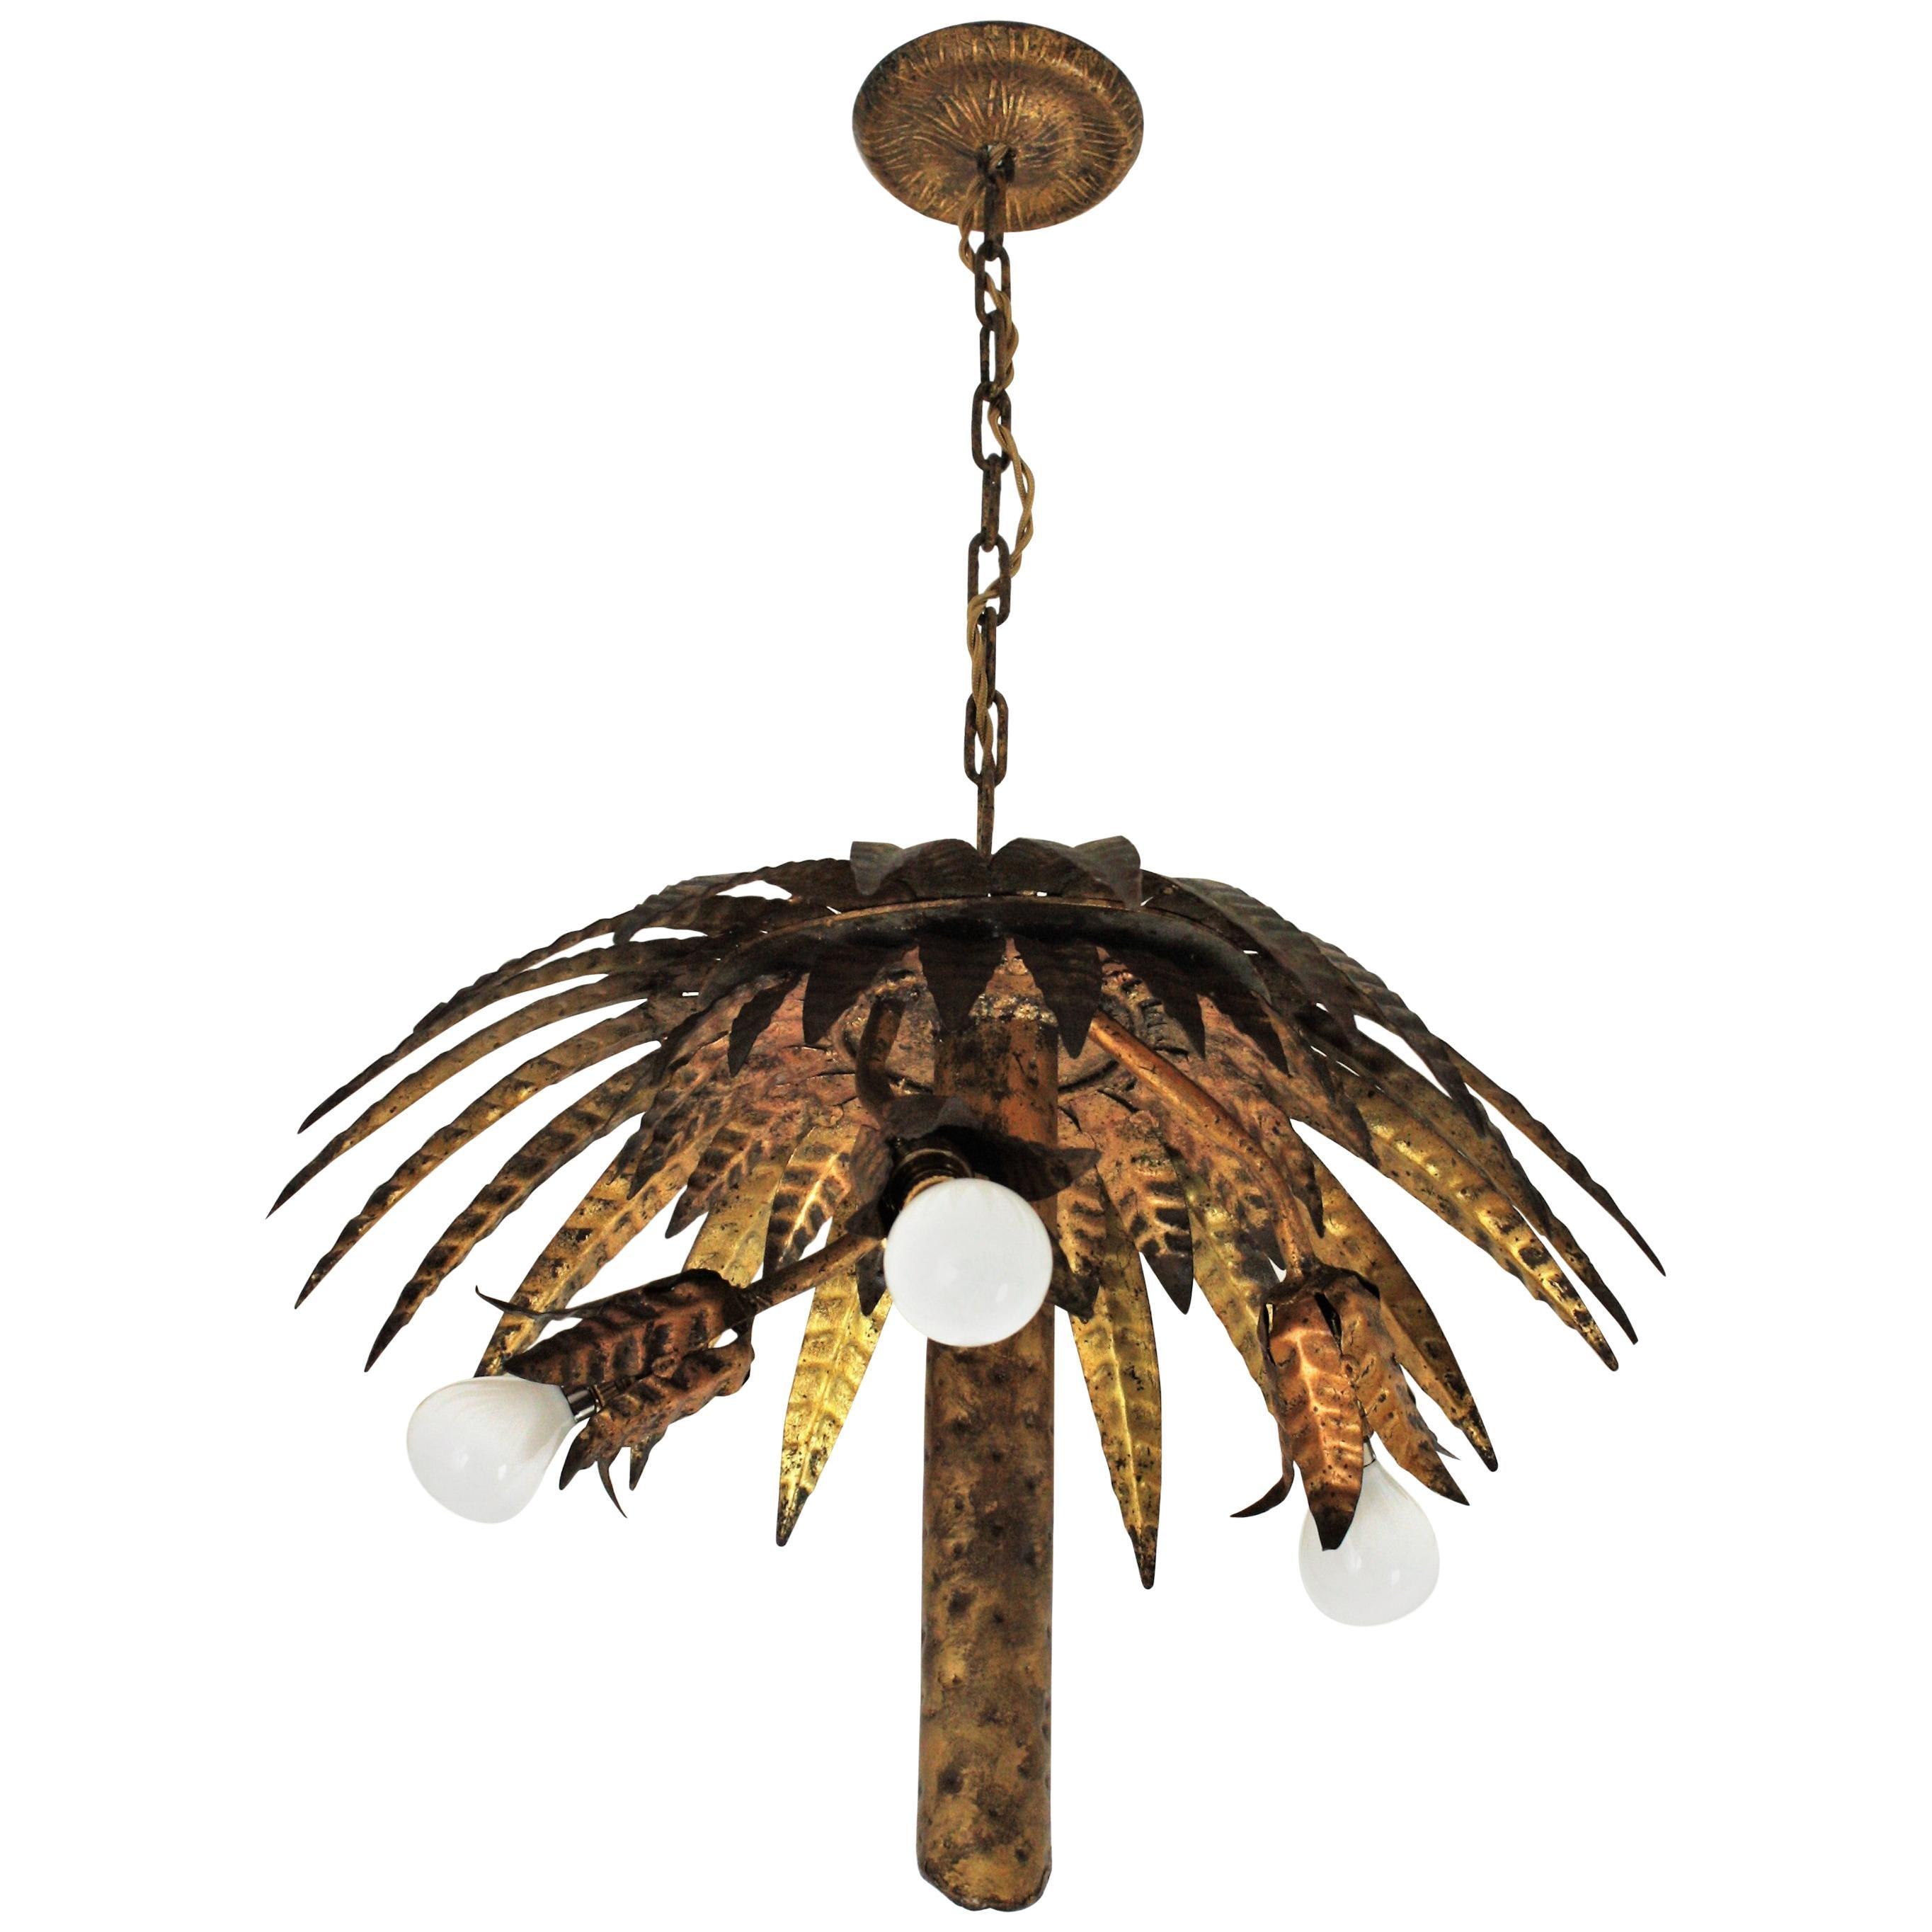 Spanish Gilt Metal Palm Tree Chandelier or Flushmount